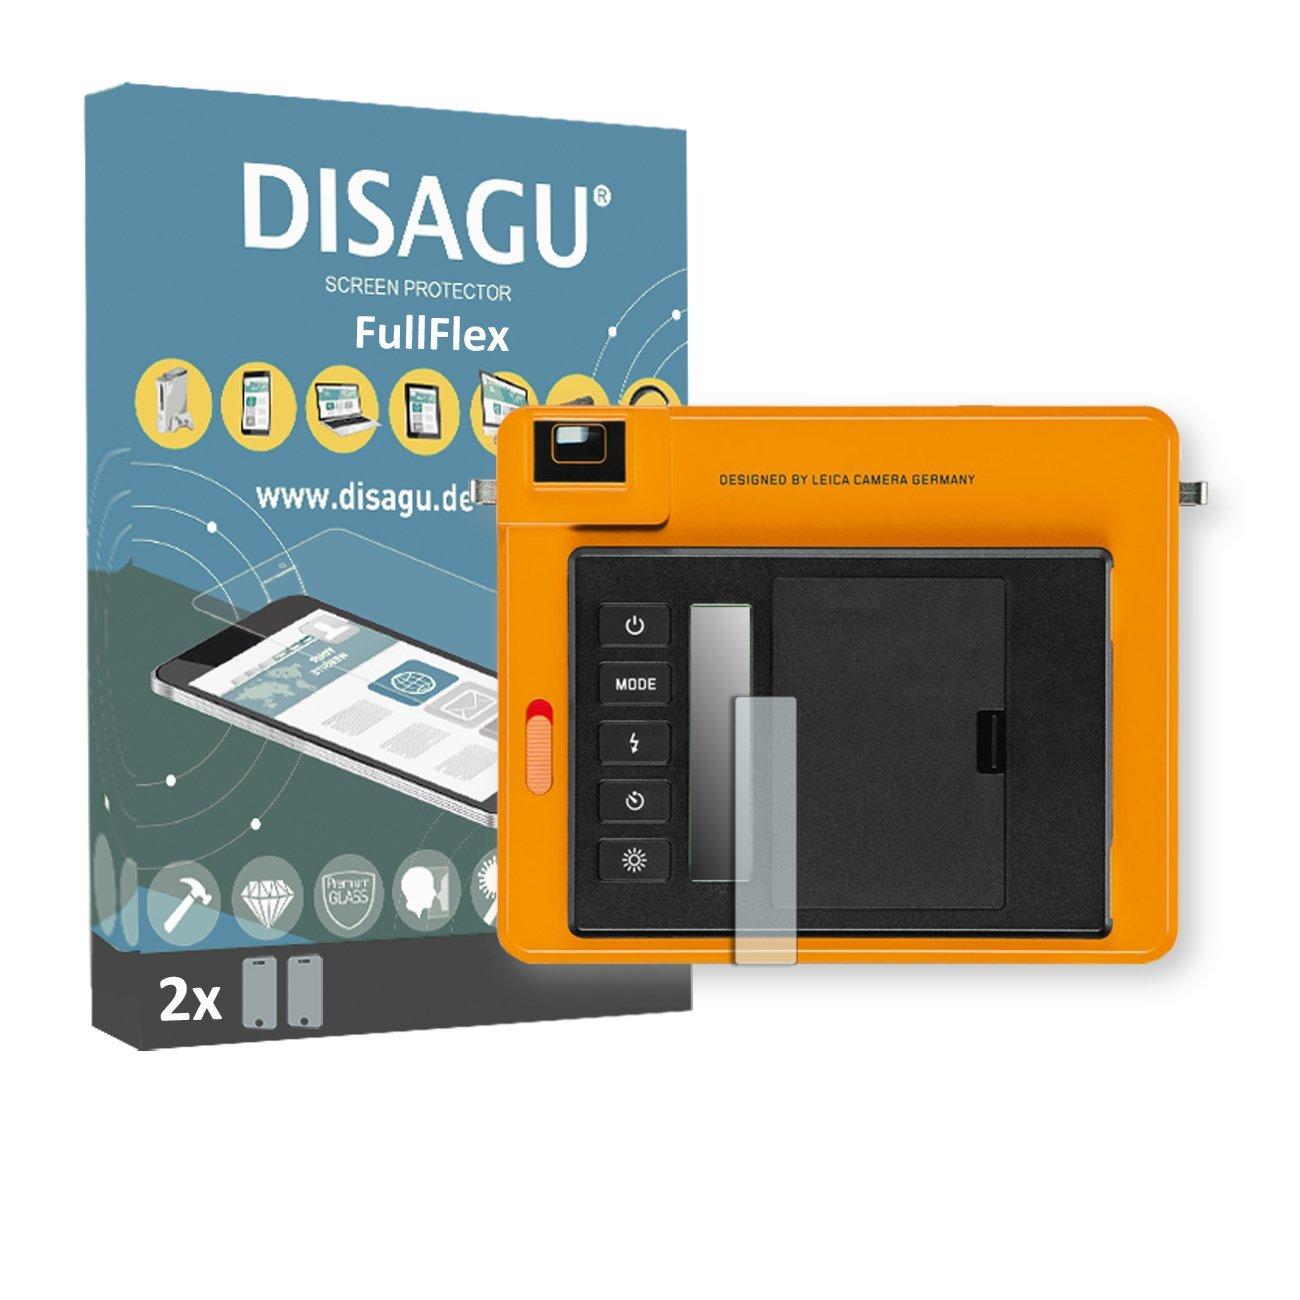 2 x Disagu FullFlex screen protector for Leica Sofort foil screen protector